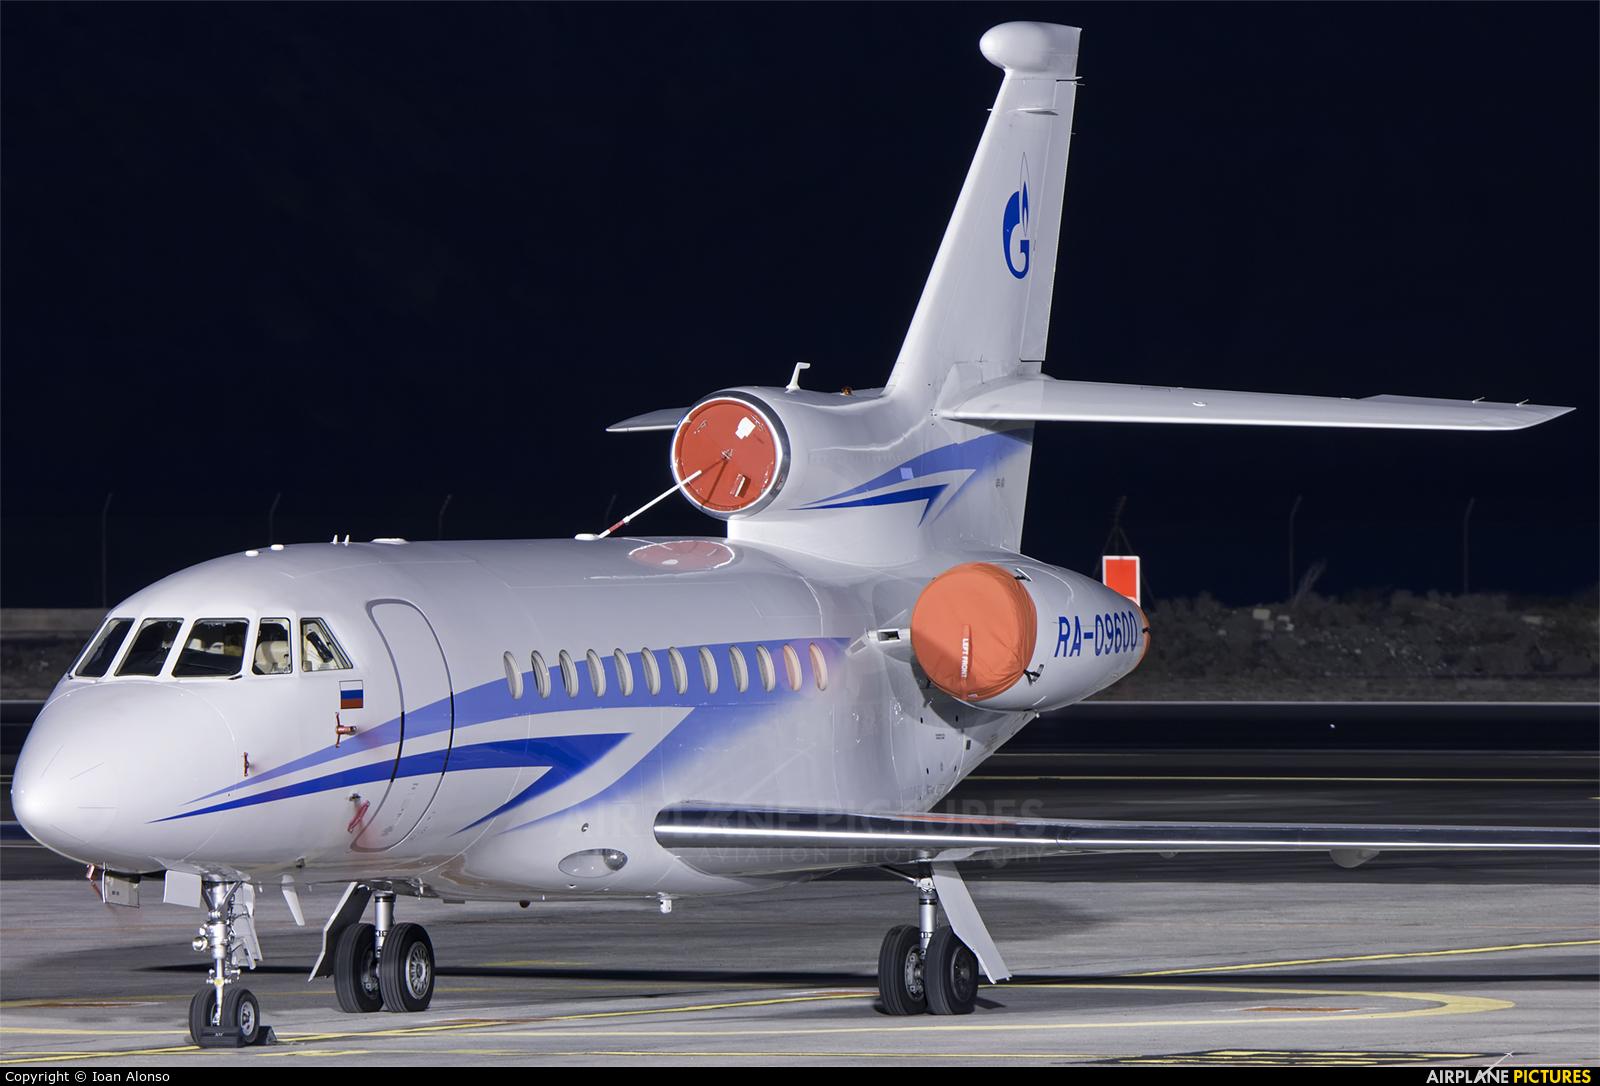 Gazpromavia RA-09600 aircraft at Tenerife Sur - Reina Sofia